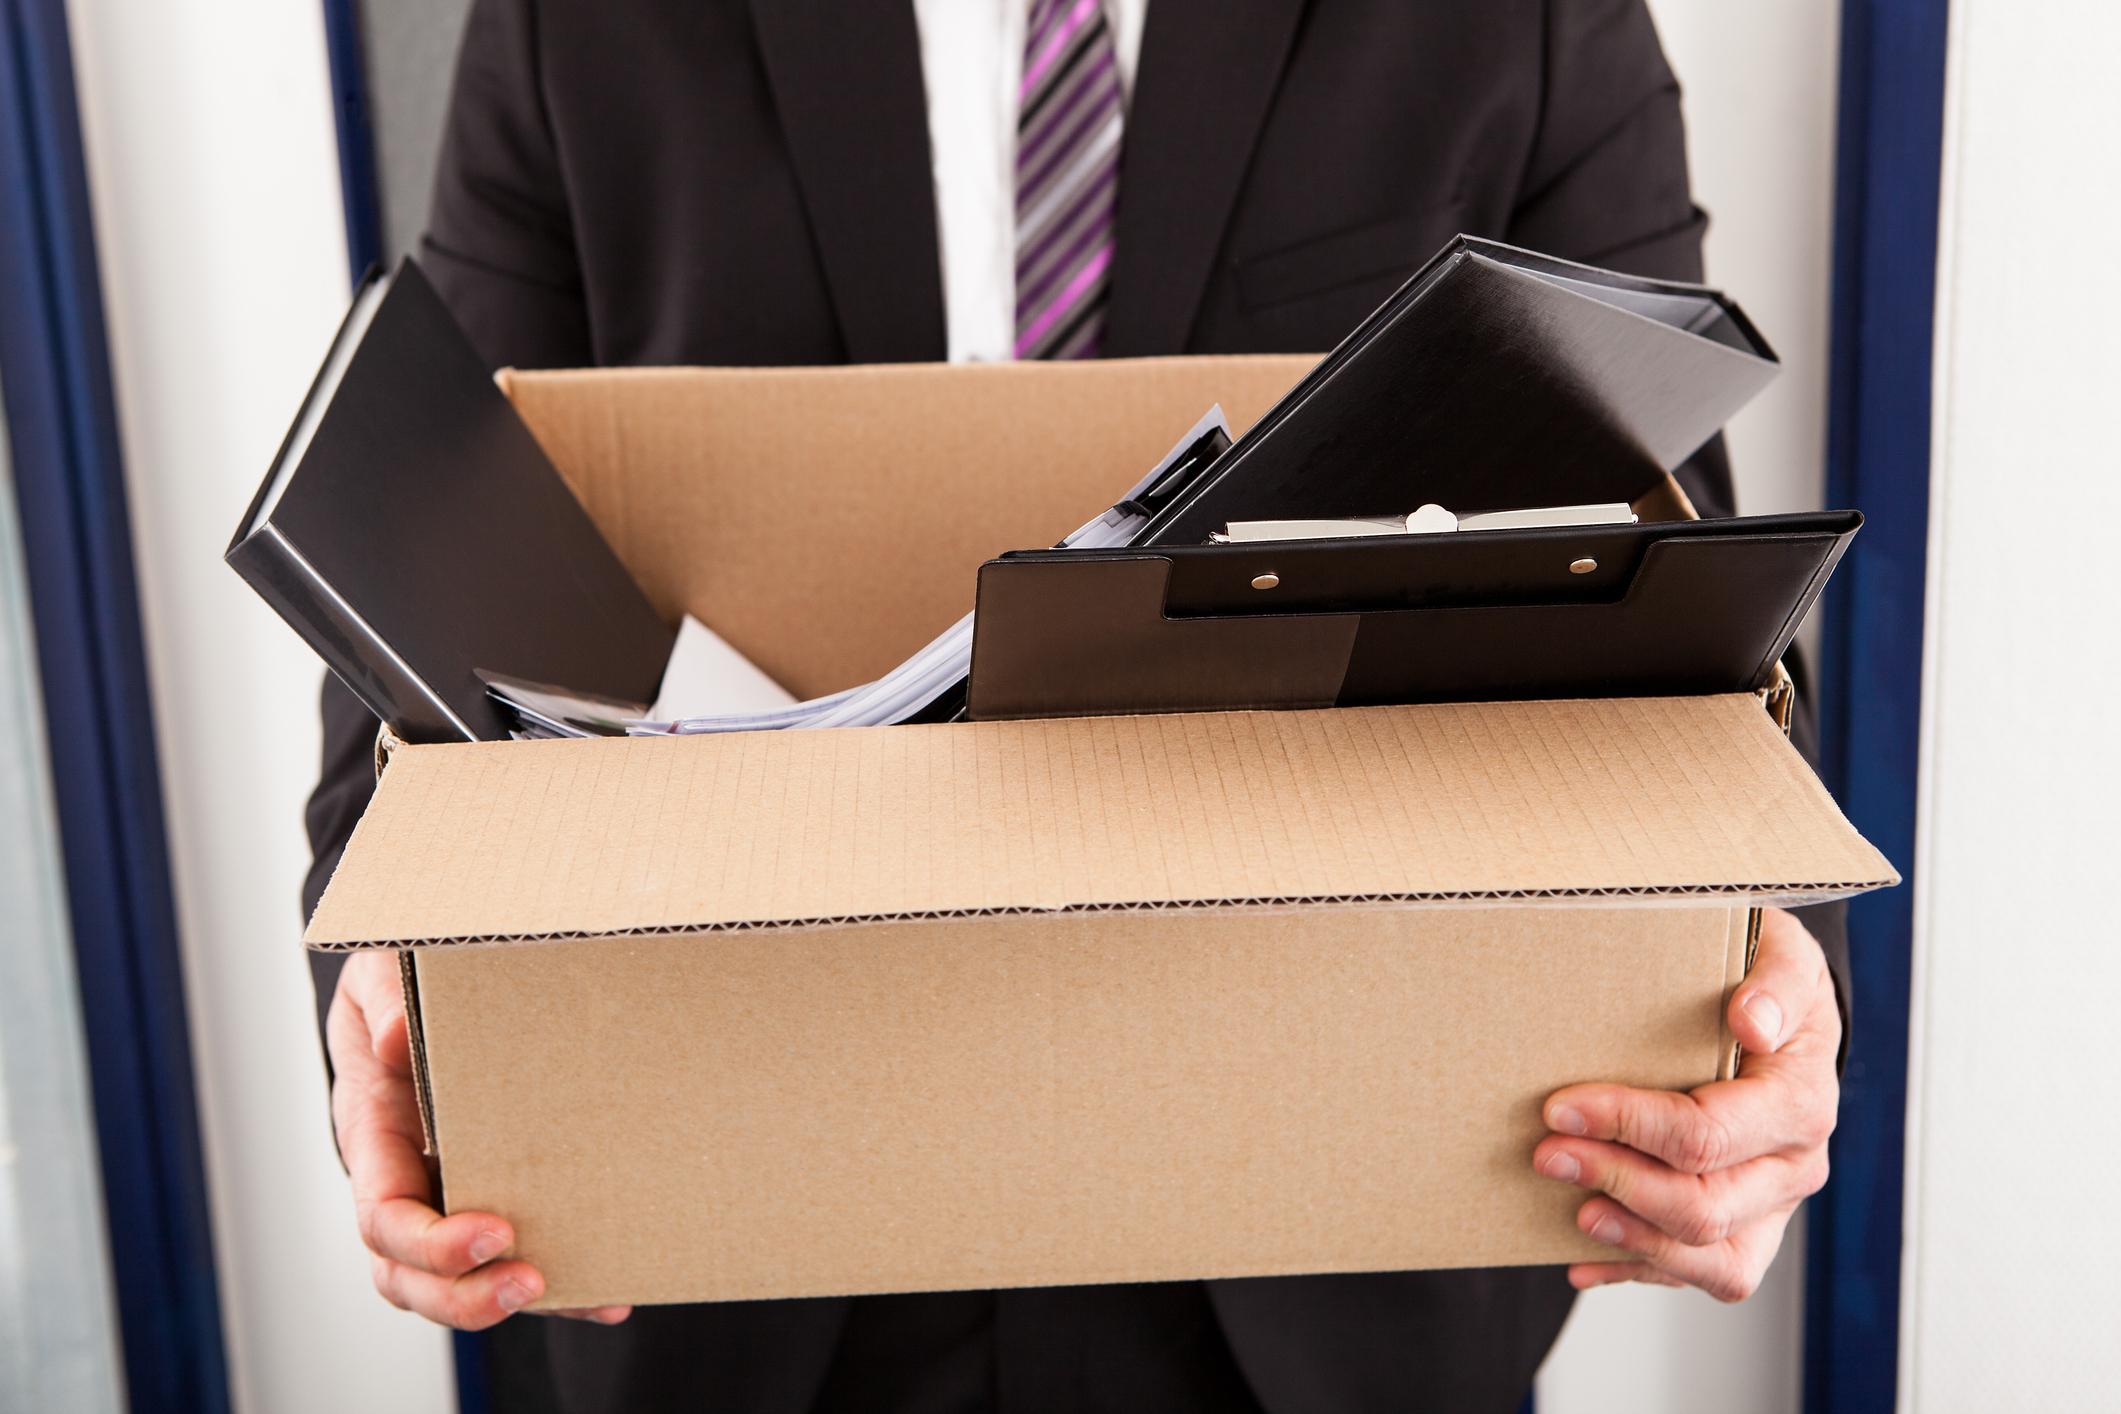 Man in suit walking with cardboard box full of belongings.